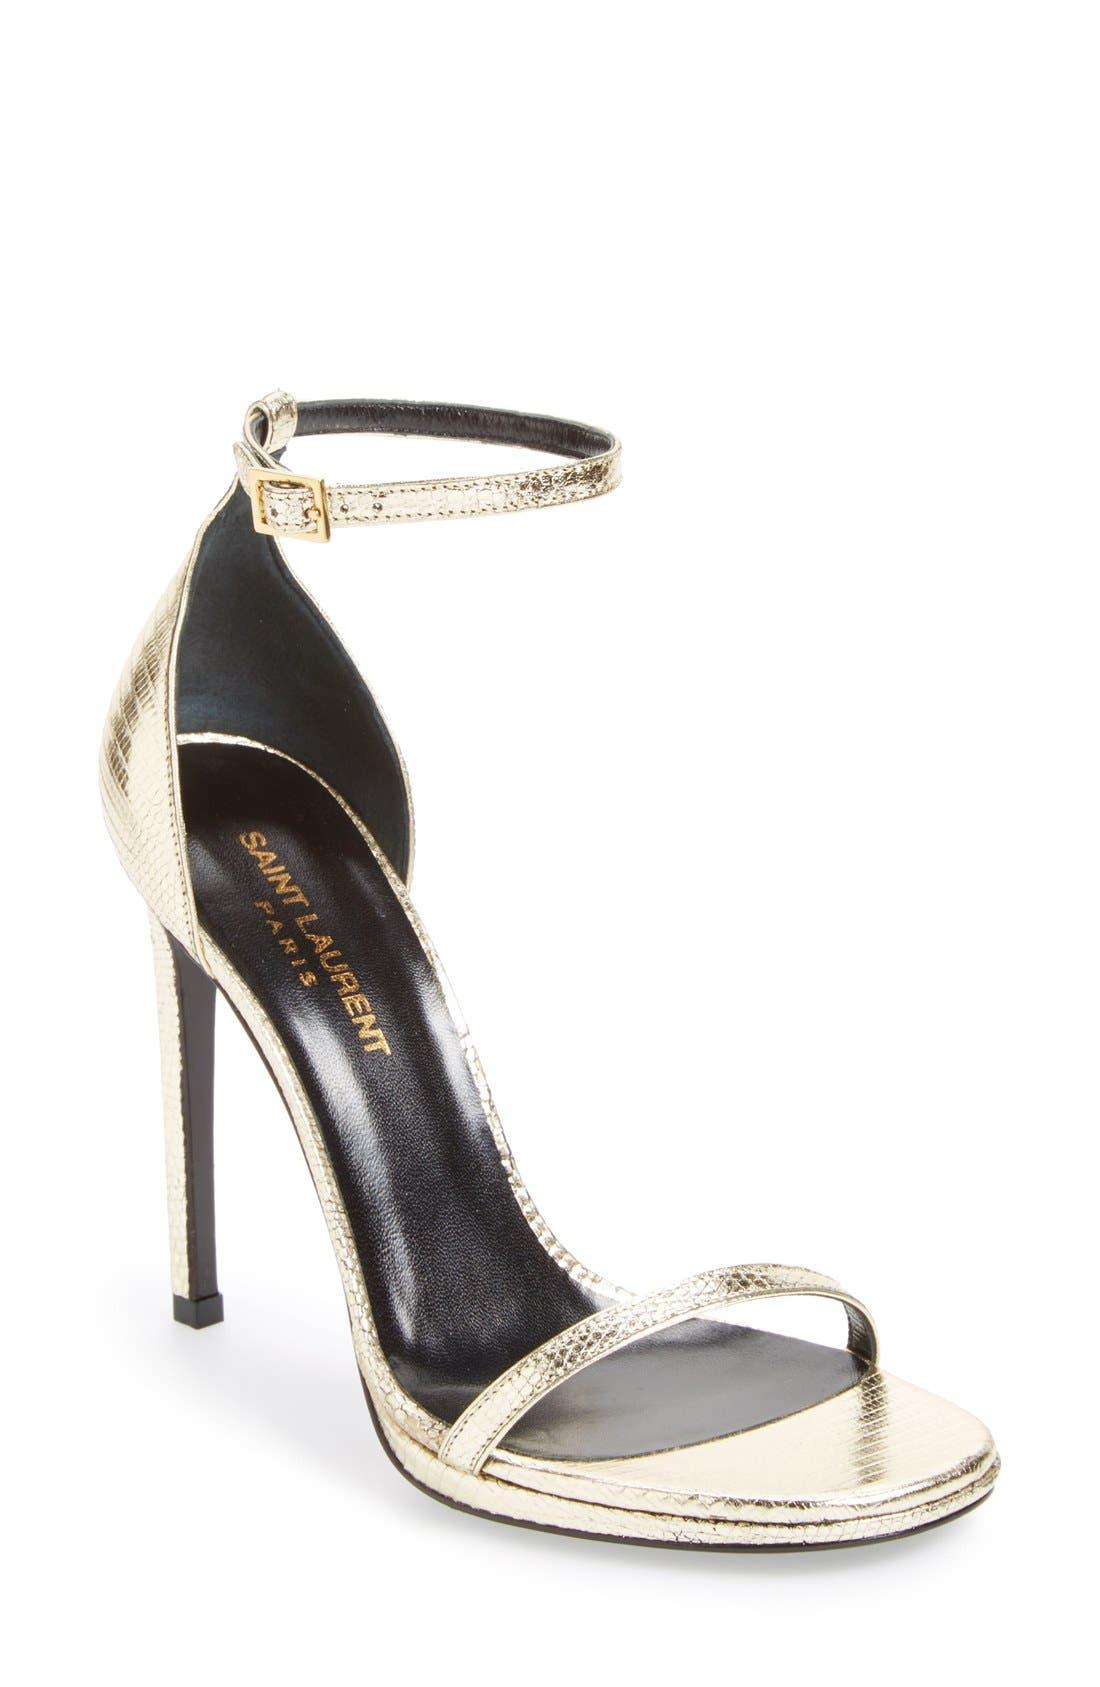 Main Image - Saint Laurent 'Jane' Metallic Lizard Embossed Ankle Strap Sandal (Women)